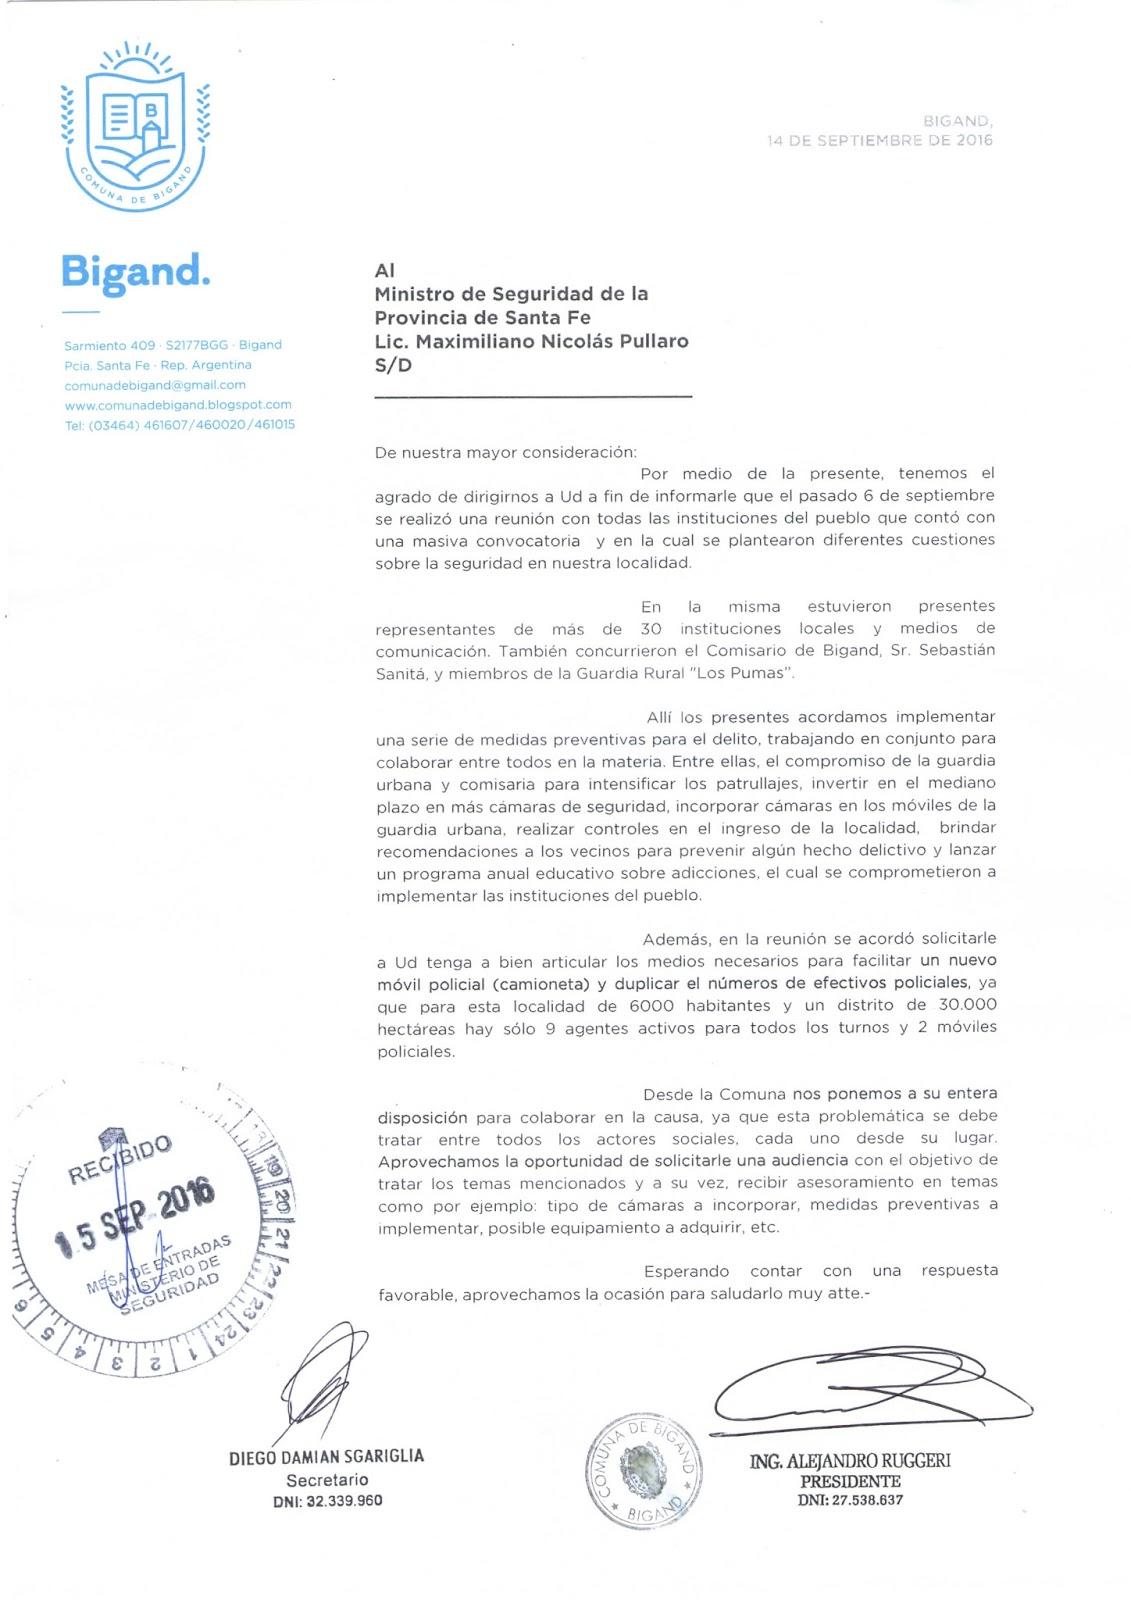 La nota dirigida al ministeriode Seguridad de Santa Fe, MaximilianoPullaro.